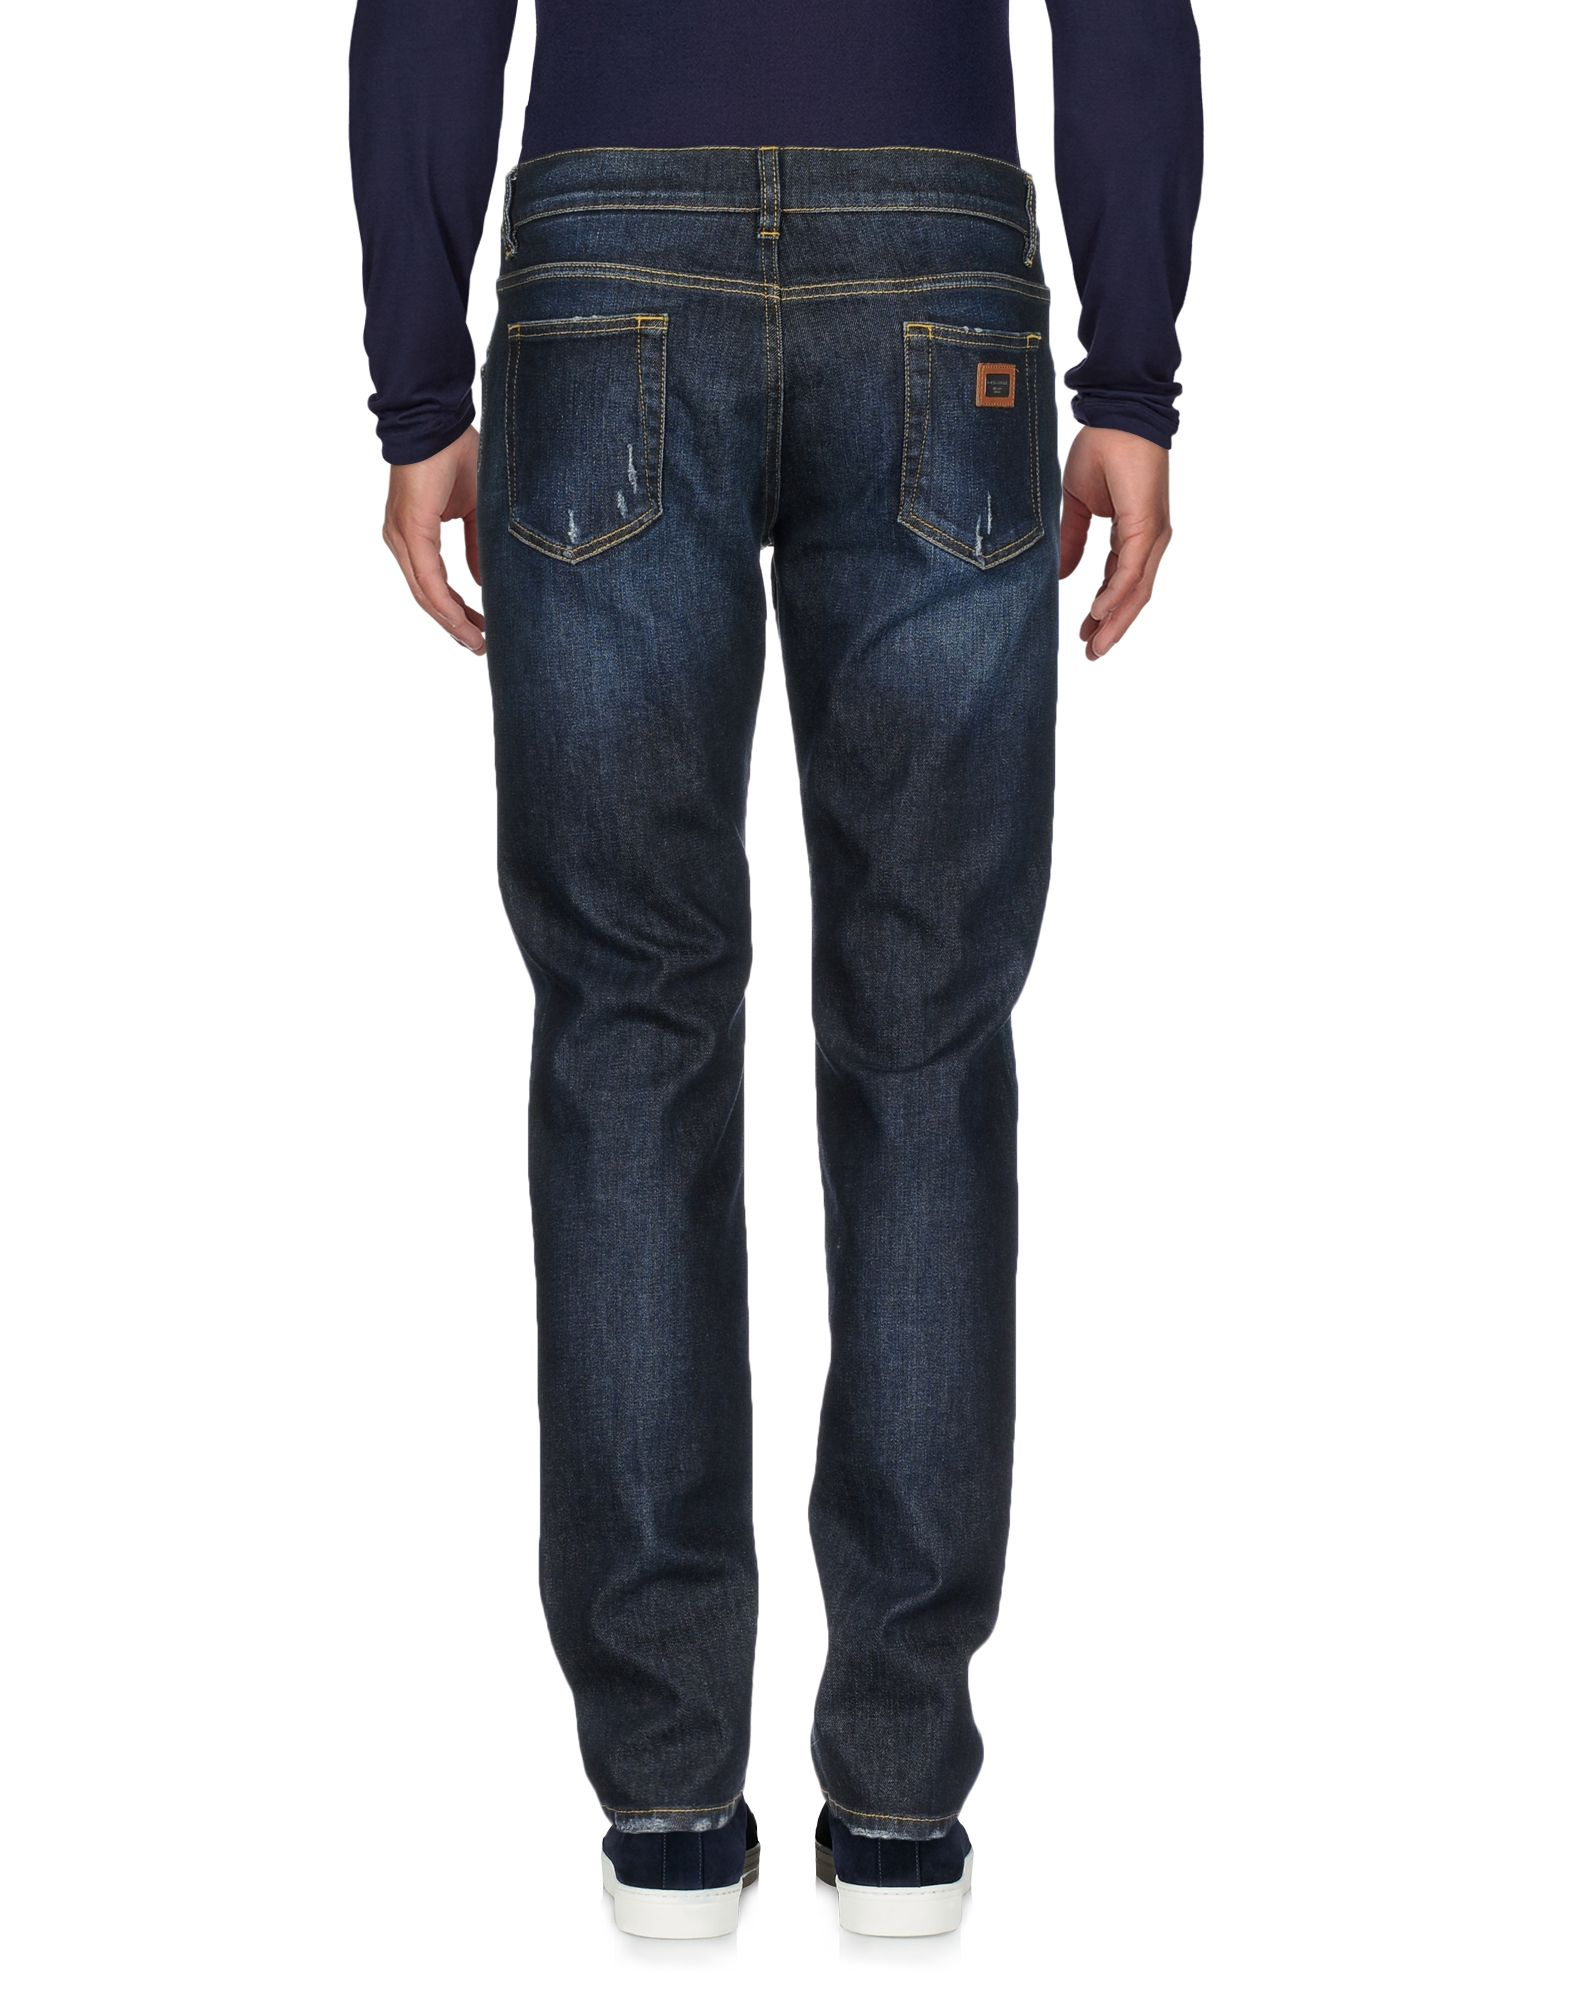 Pantaloni Jeans Dolce & & Dolce Gabbana Uomo - 42677238OV aa5687